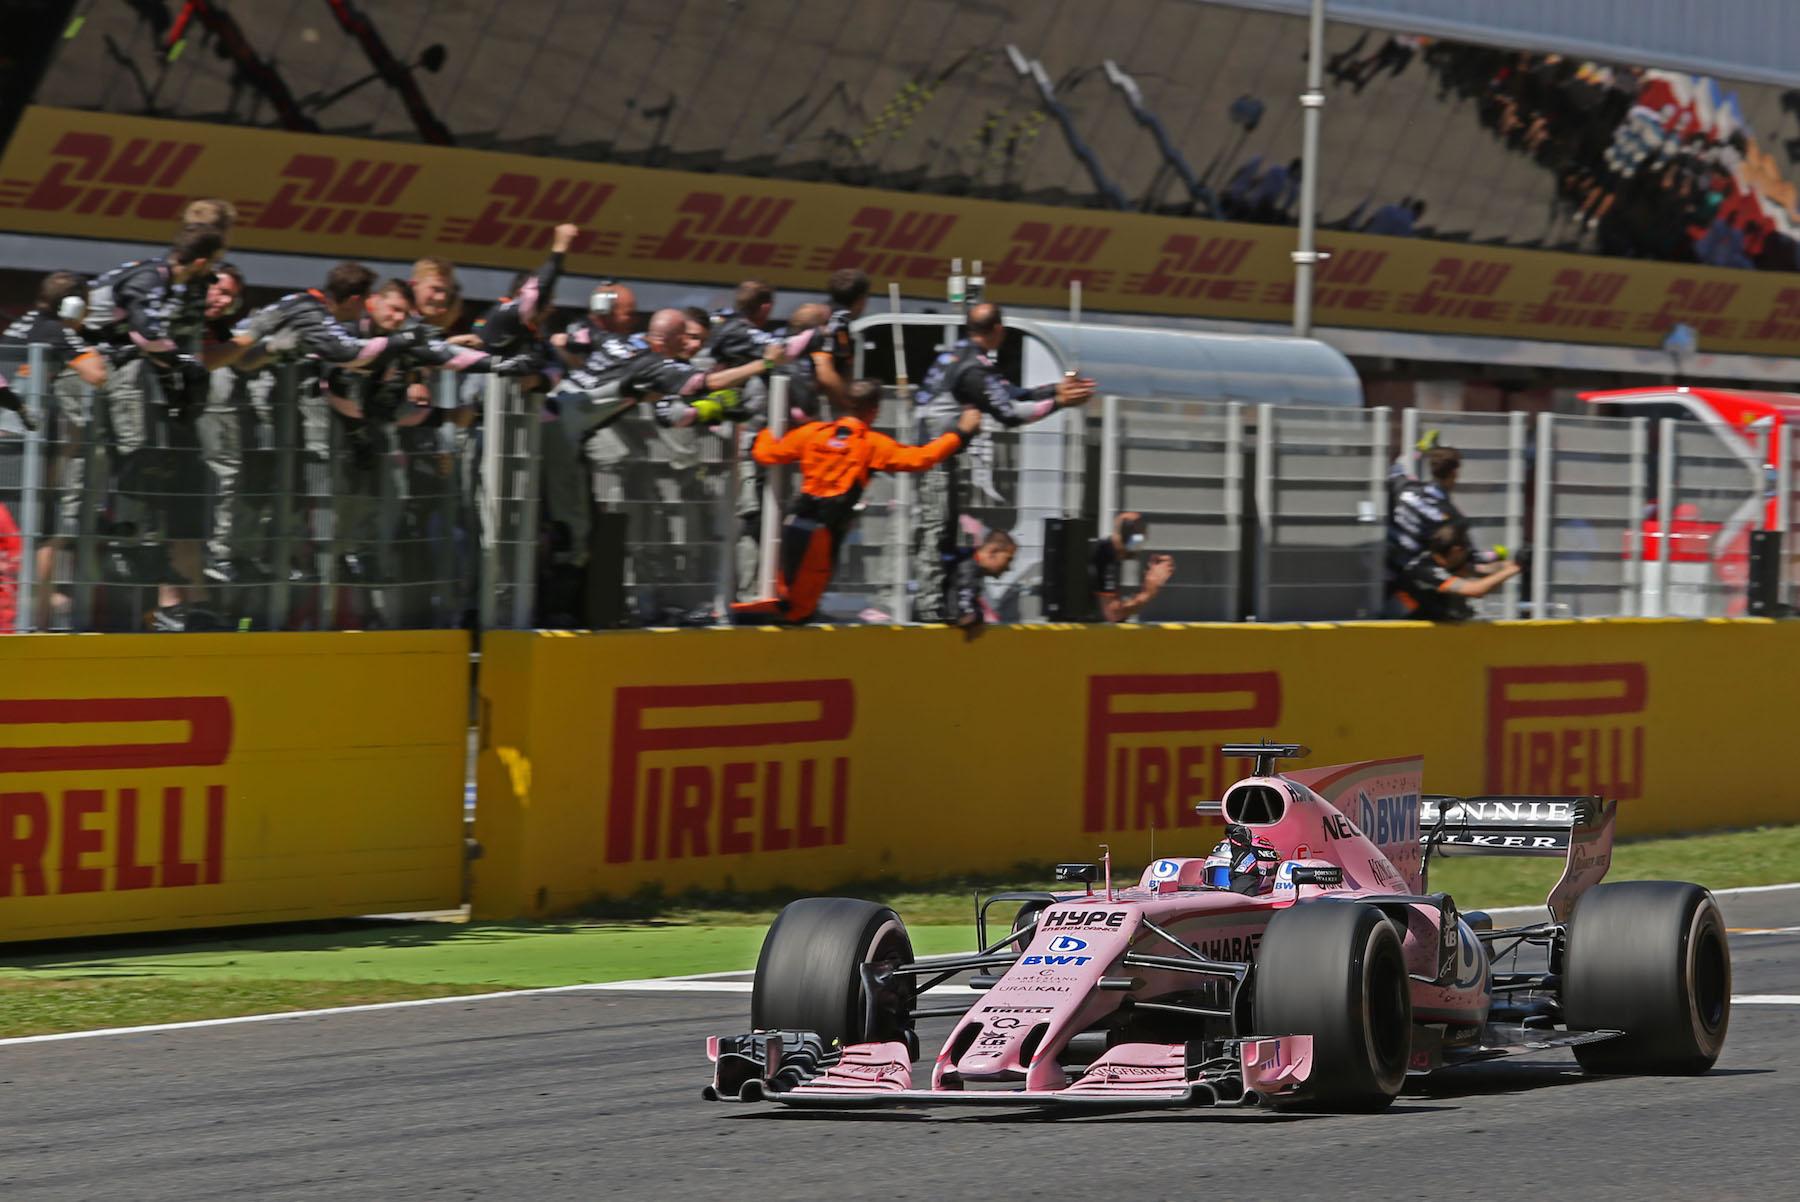 M 2017 Sergio Perez | Force India VJM10 | 2017 Spanish GP P4 1 copy.jpg